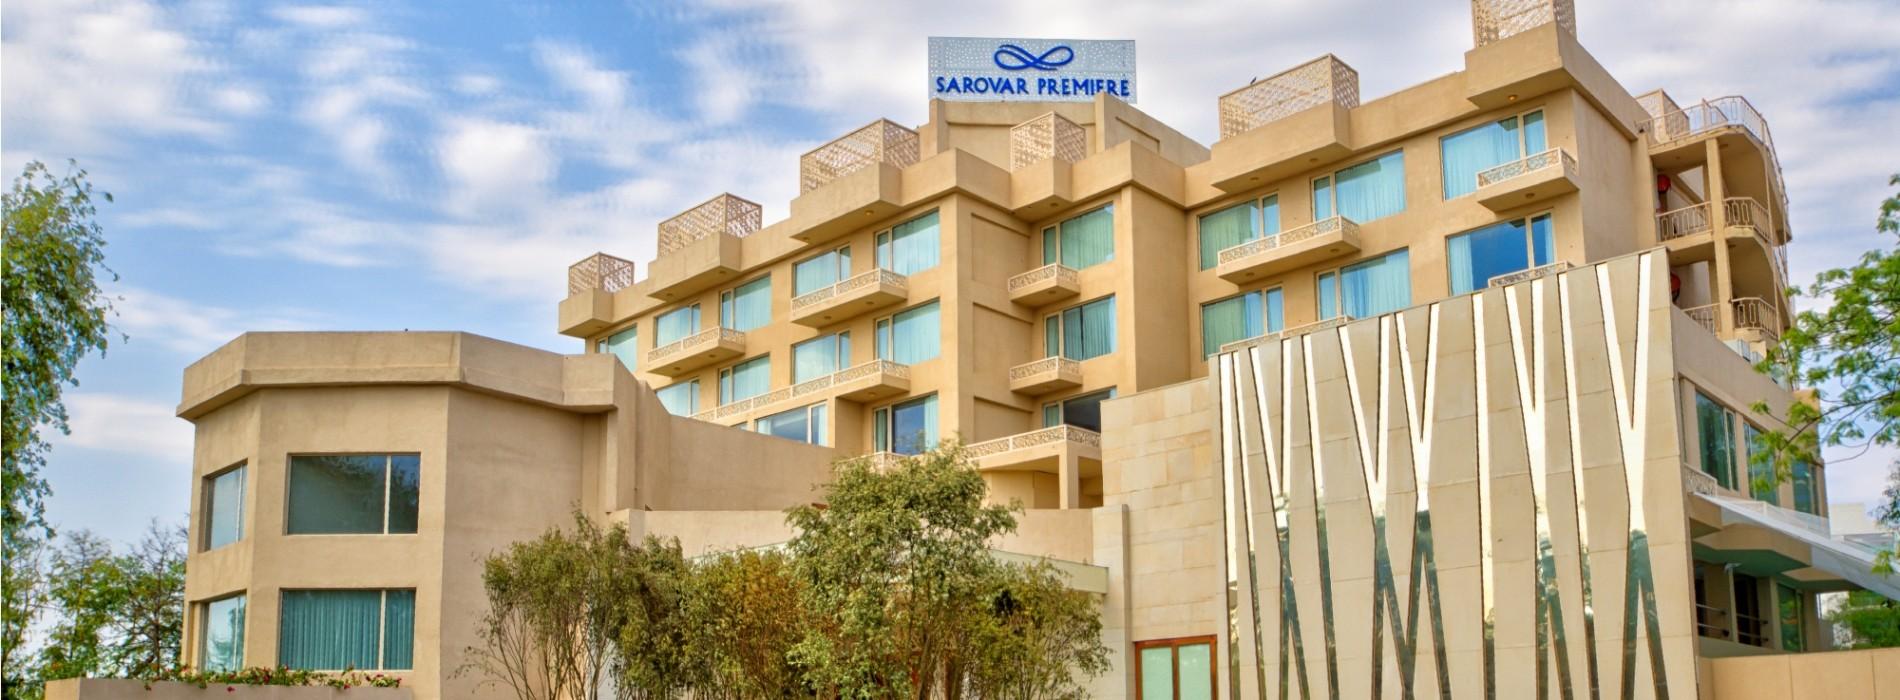 Sarovar Hotels announces opening of Sarovar Premiere Jaipur